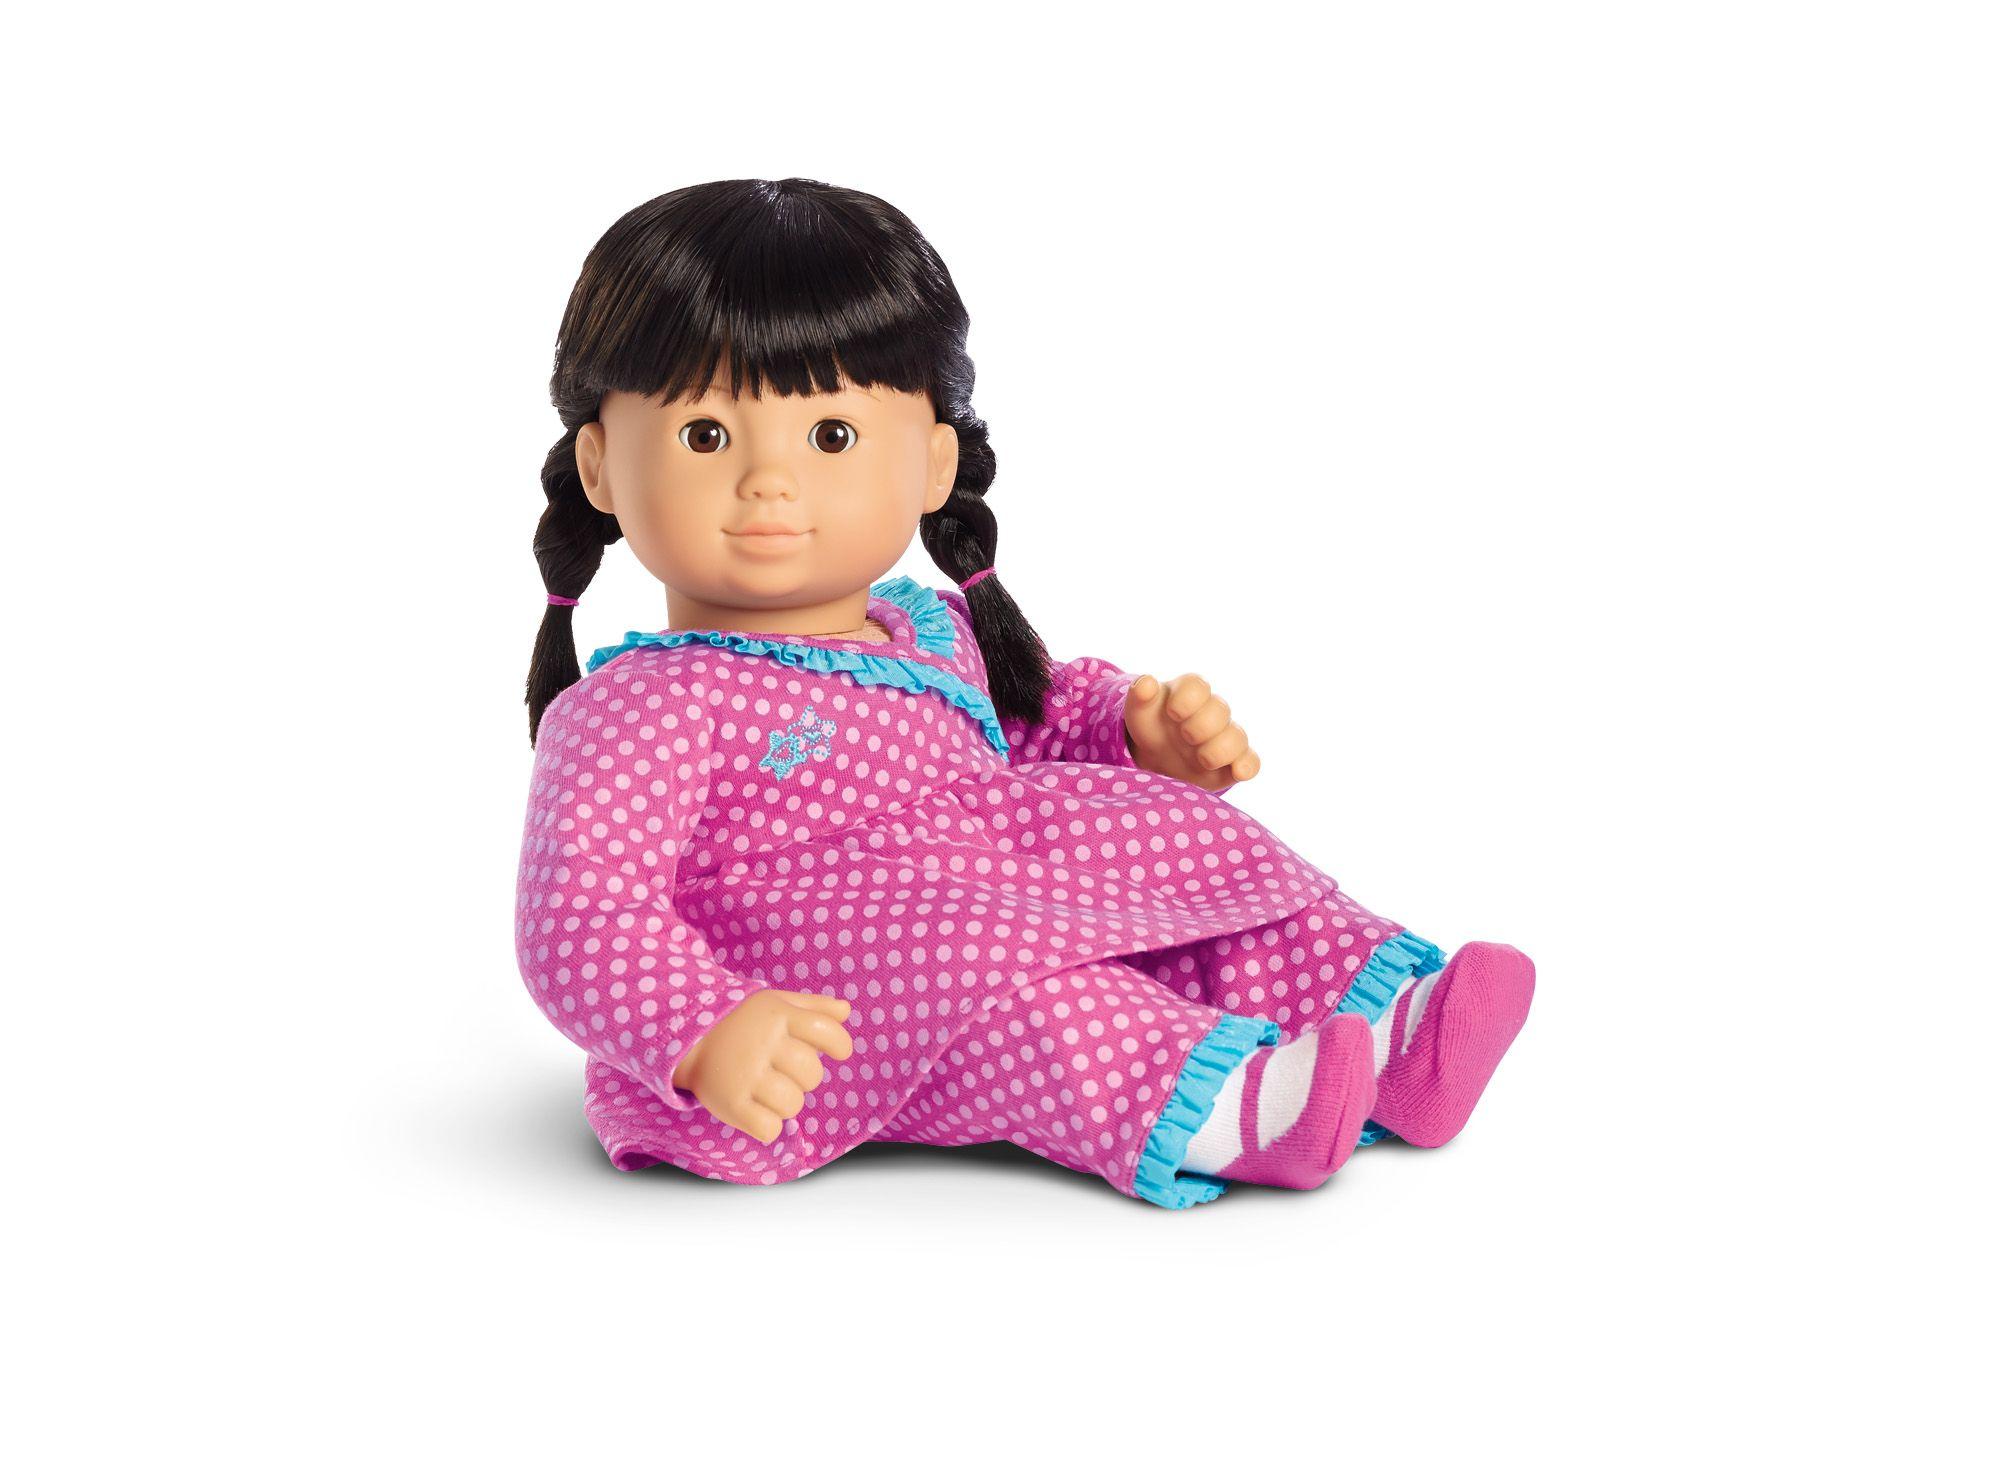 Pink Polka Dot Pajamas for Dolls Bitty Baby Pinterest